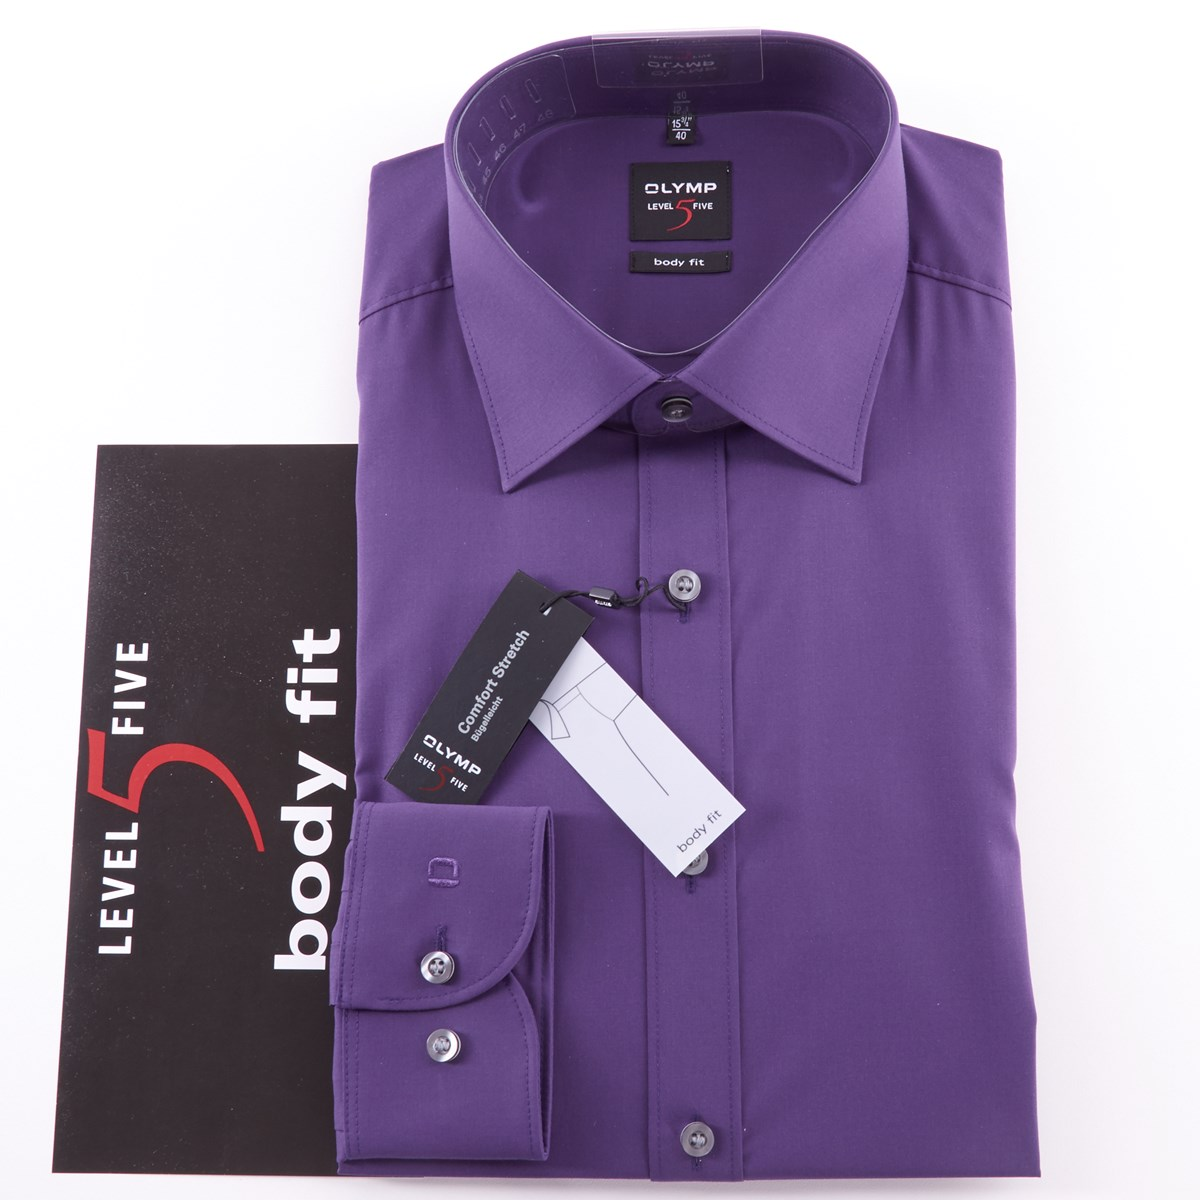 6e1fd7acdbfbbf1 Olymp Level 5 Standard Collar Shirt, Slim Fit Purple - The Kilt Store